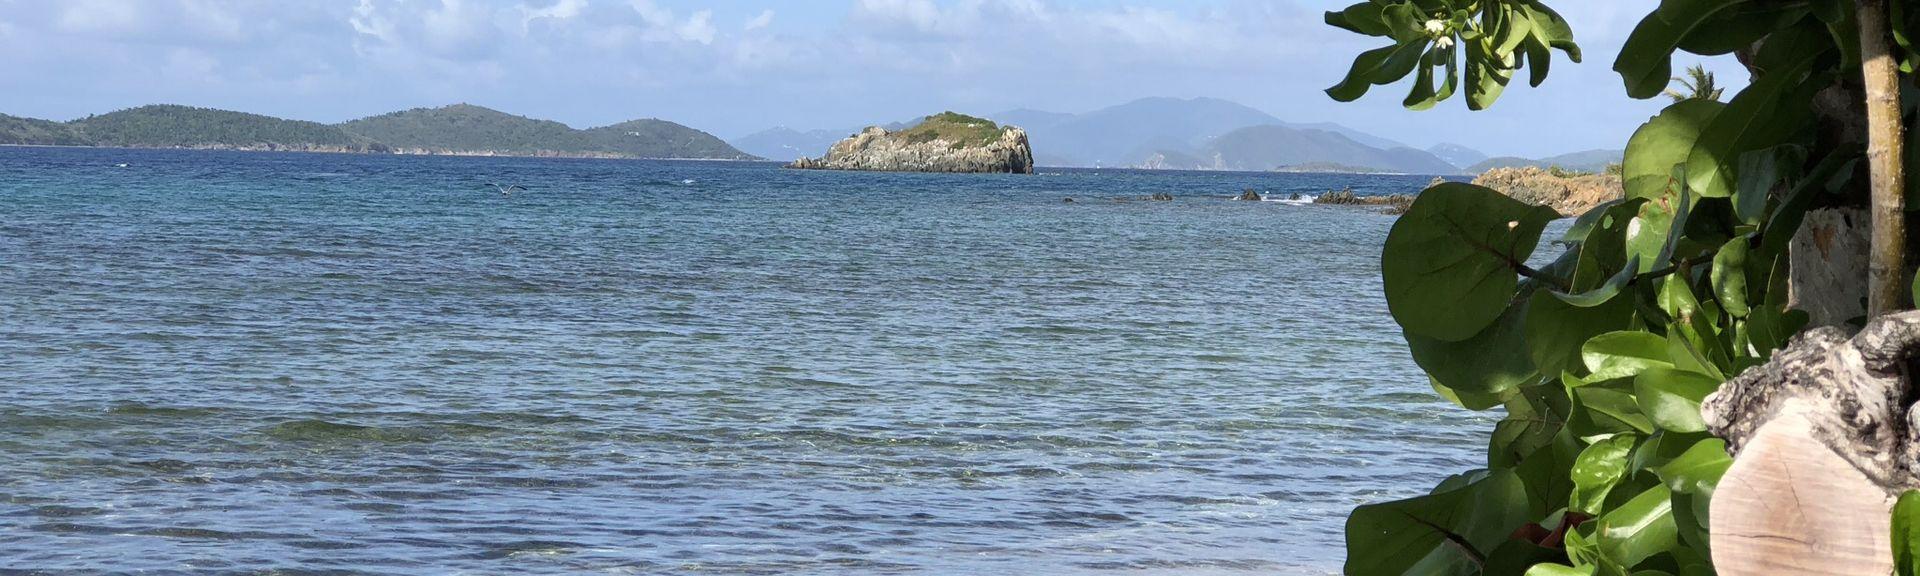 Sapphire Village, St. Thomas, U.S. Virgin Islands